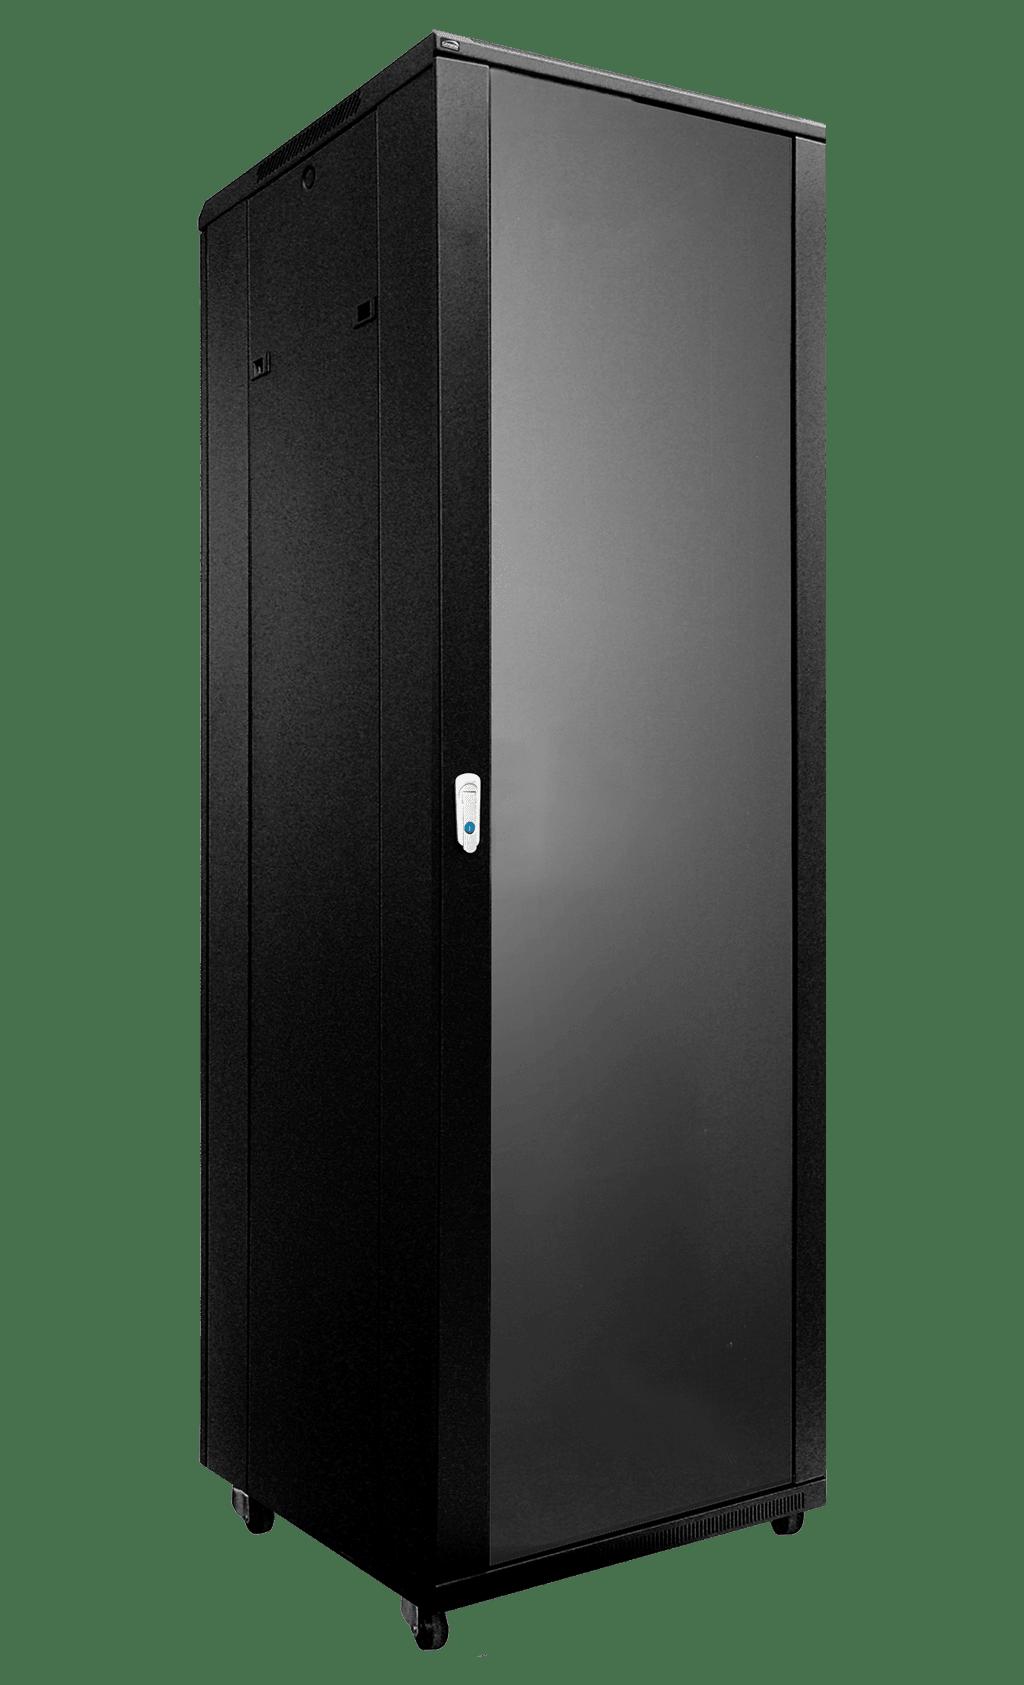 "SPR642 - 19"" rack cabinet - 42 units - 600mm depth"